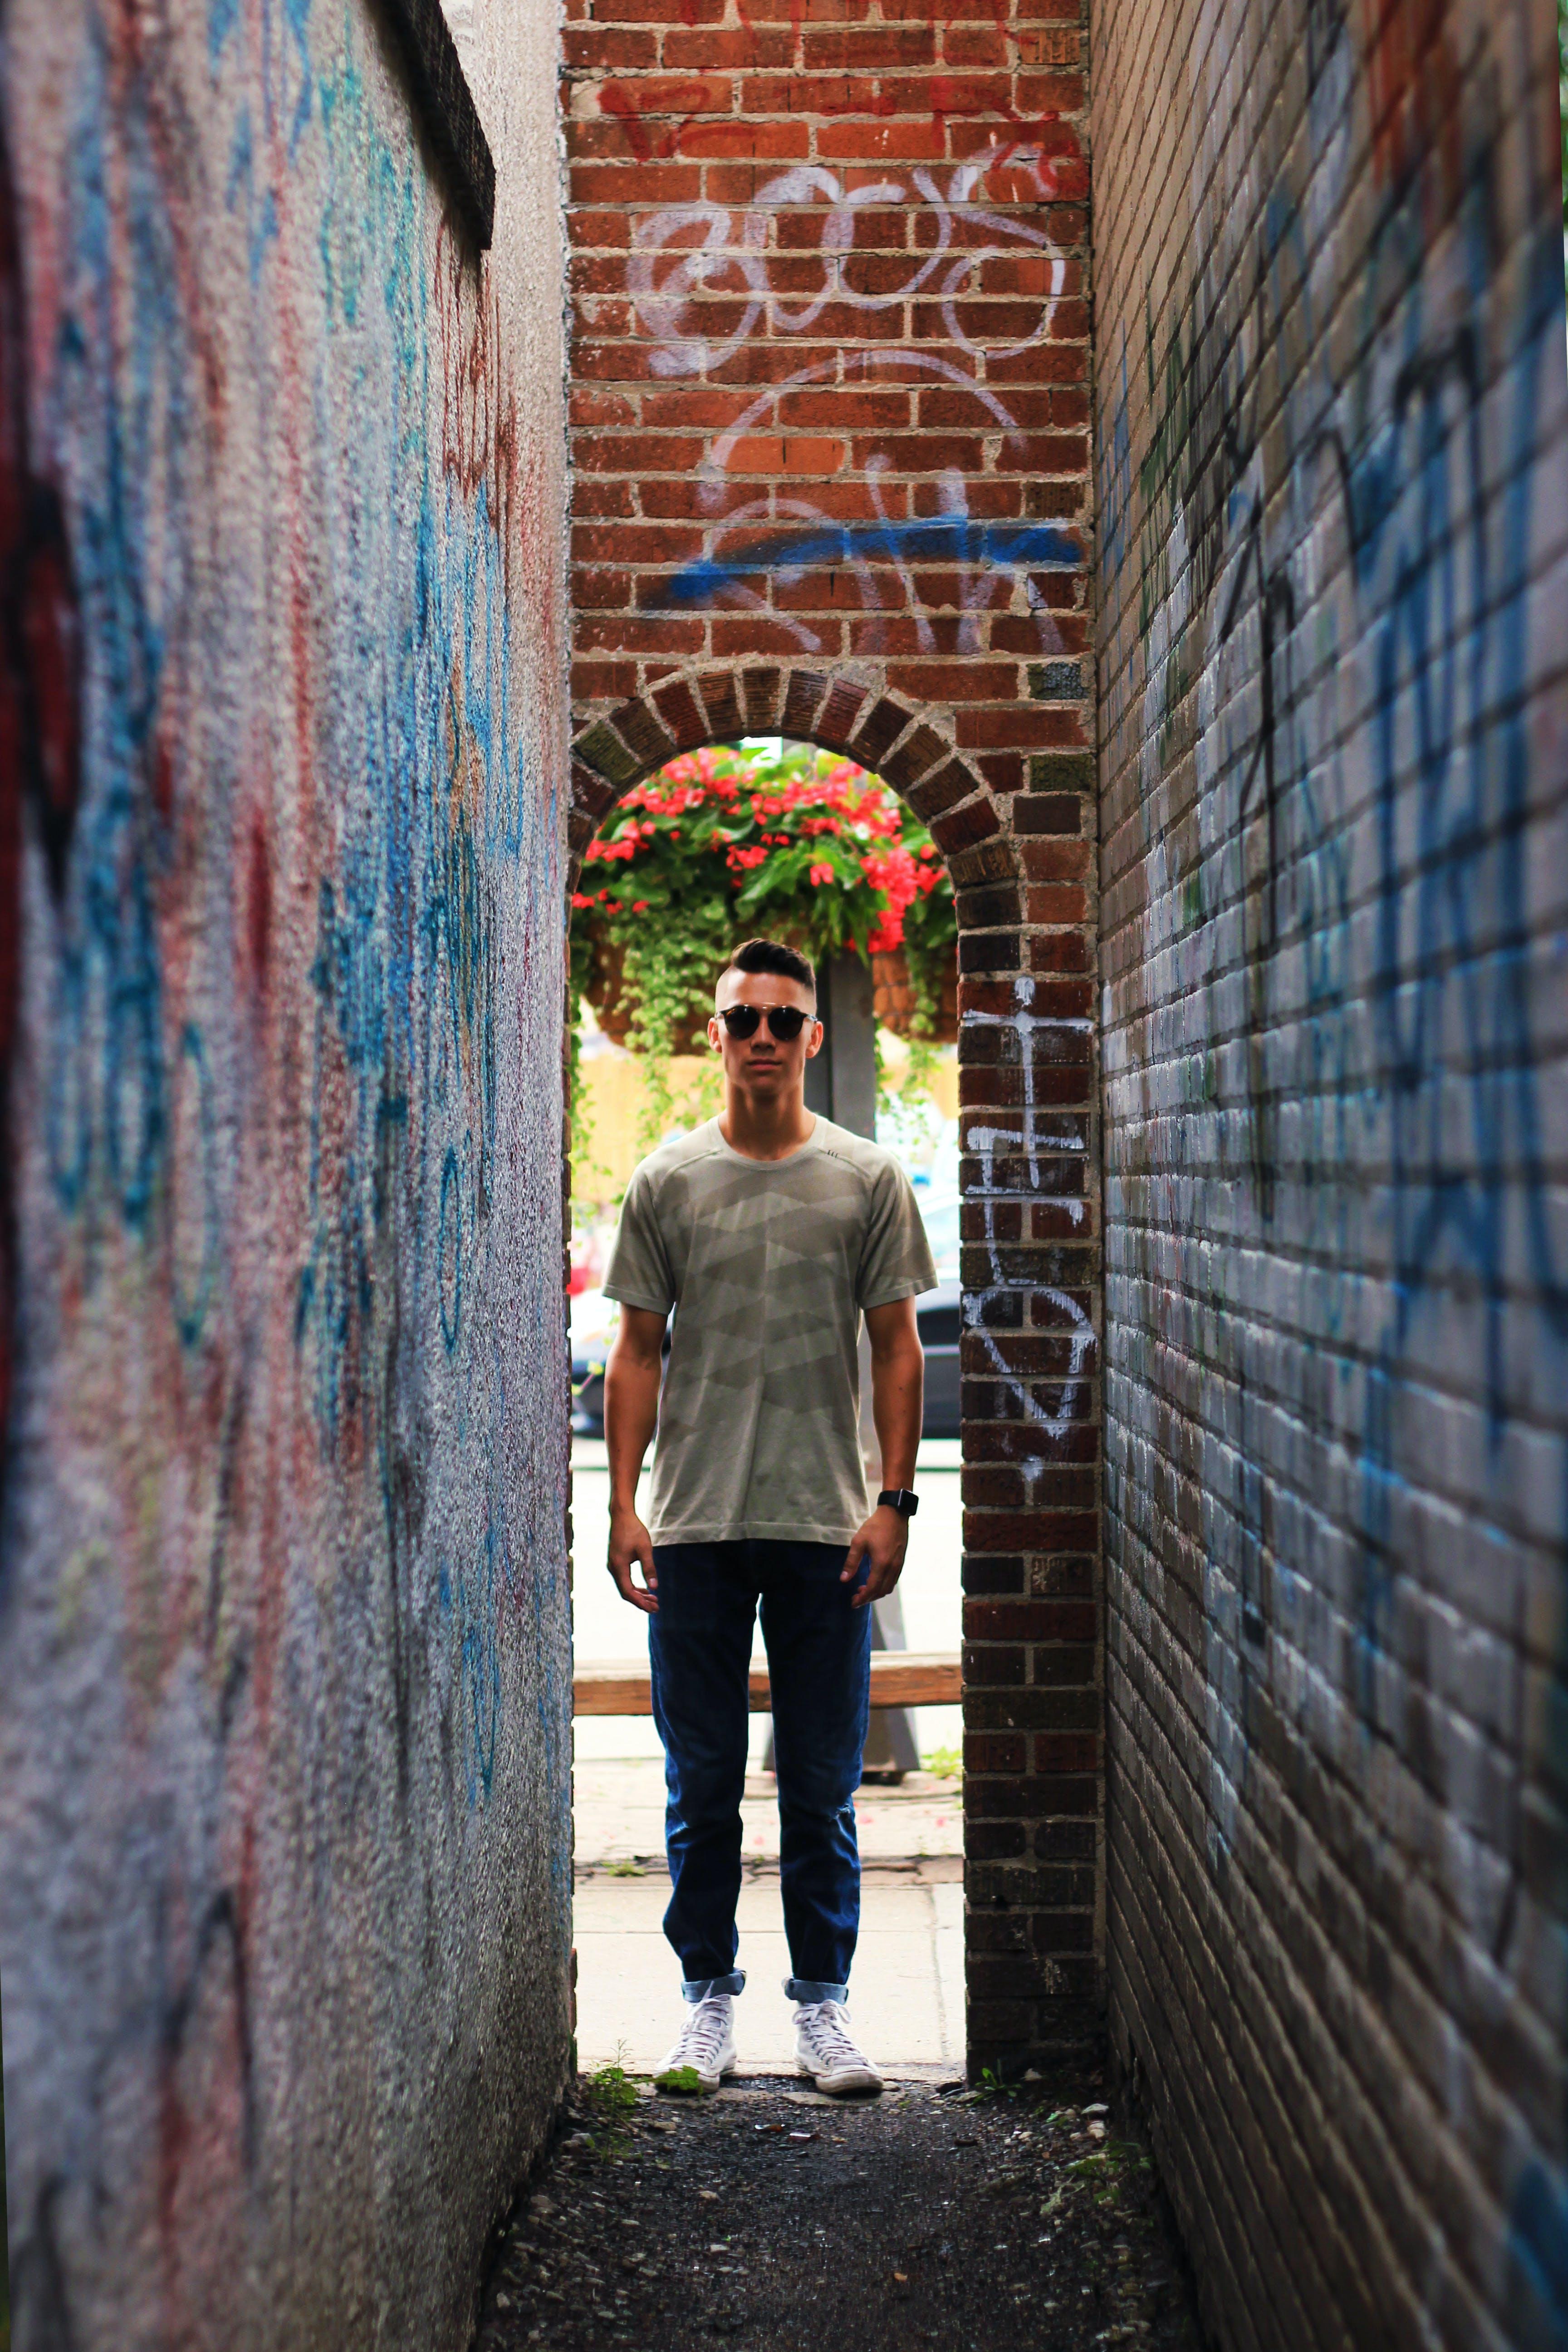 Free stock photo of graffiti, street art, arch, frame